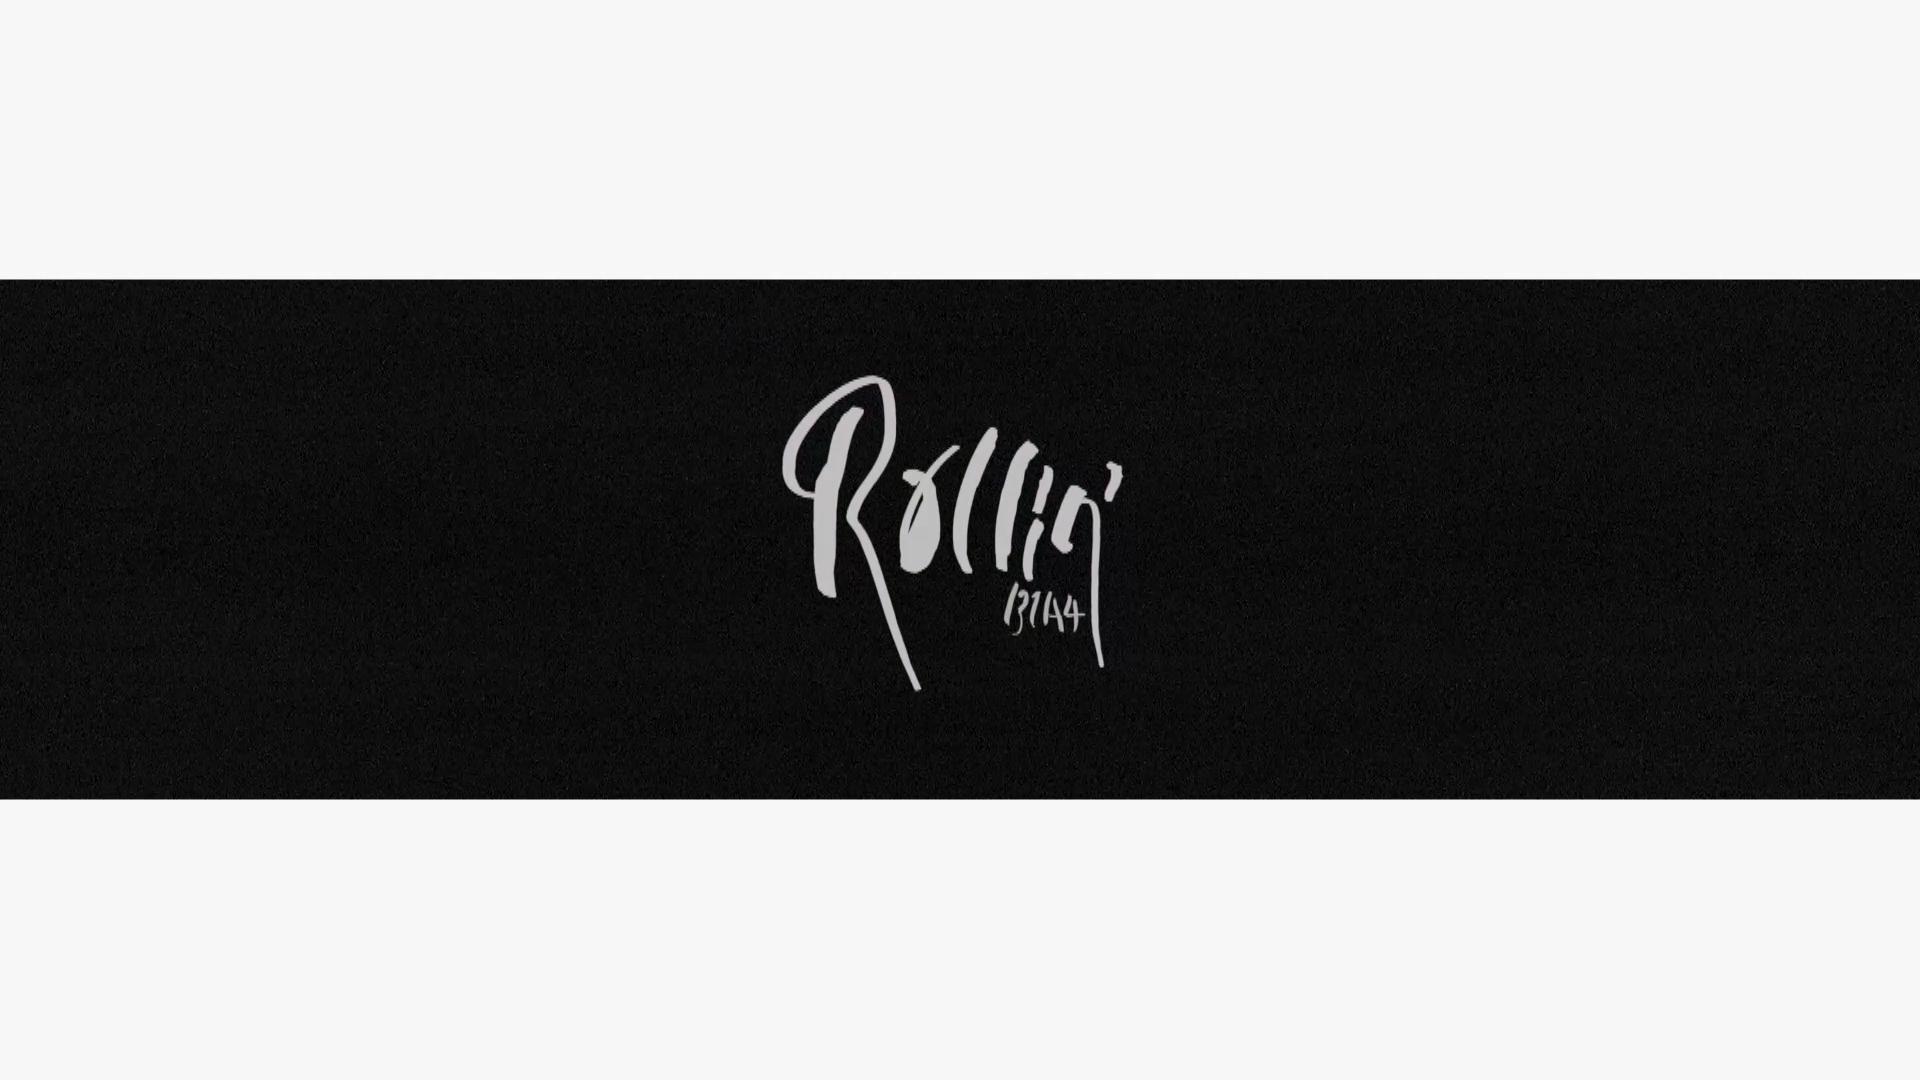 B1A4 - Rollin' (Teaser)